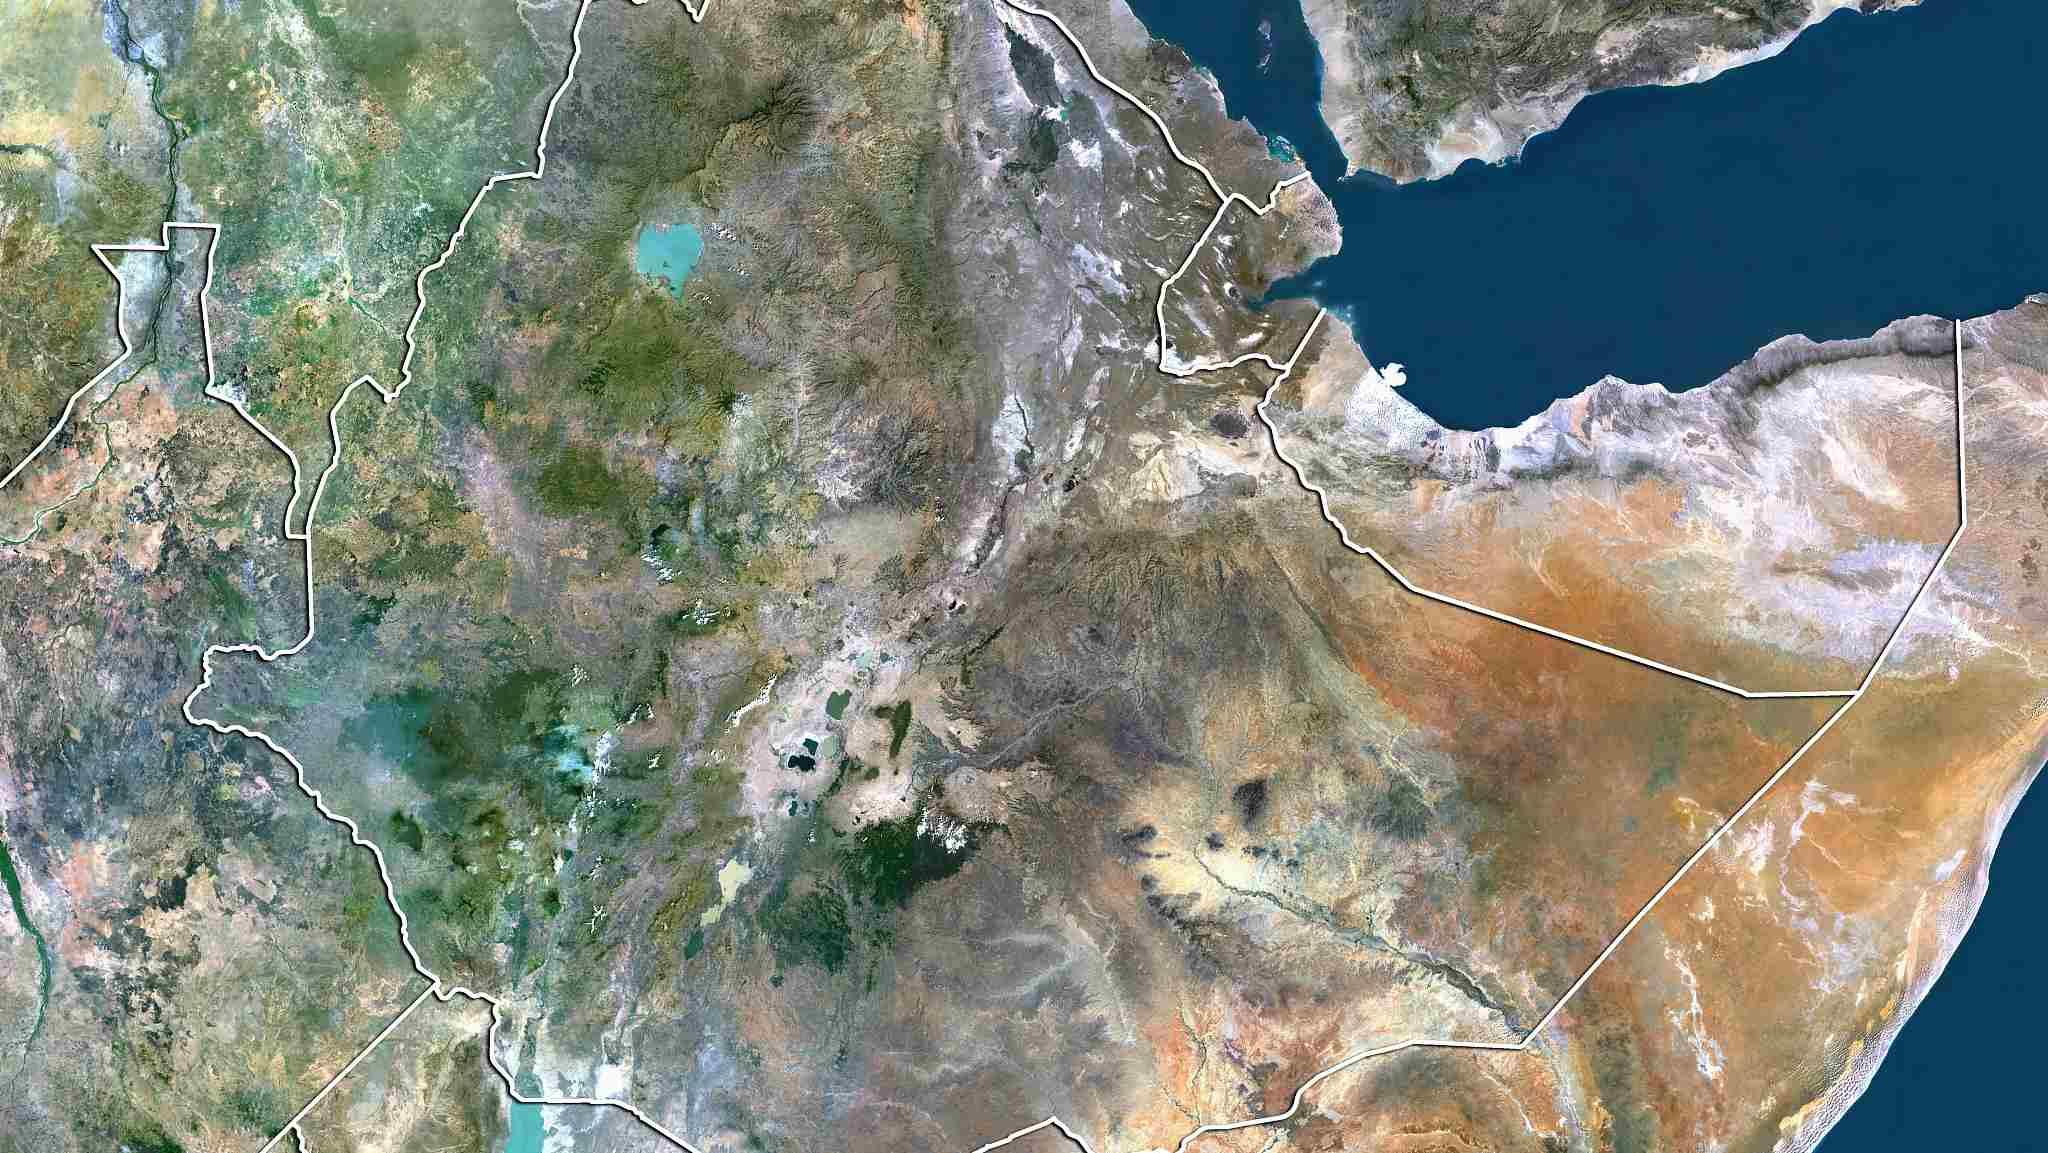 Ethiopia to launch first satellite in step toward space ... on capital of ethiopia, afar region ethiopia, elevation of ethiopia, national flag of ethiopia, awash ethiopia, native animal in ethiopia, flora of ethiopia, satellite map kenya, village of ethiopia, city of ethiopia, road map ethiopia, gojjam ethiopia, geographic features of ethiopia, king of ethiopia, food of ethiopia, coordinates of ethiopia, aerial view of ethiopia, sodo ethiopia, nazret ethiopia,